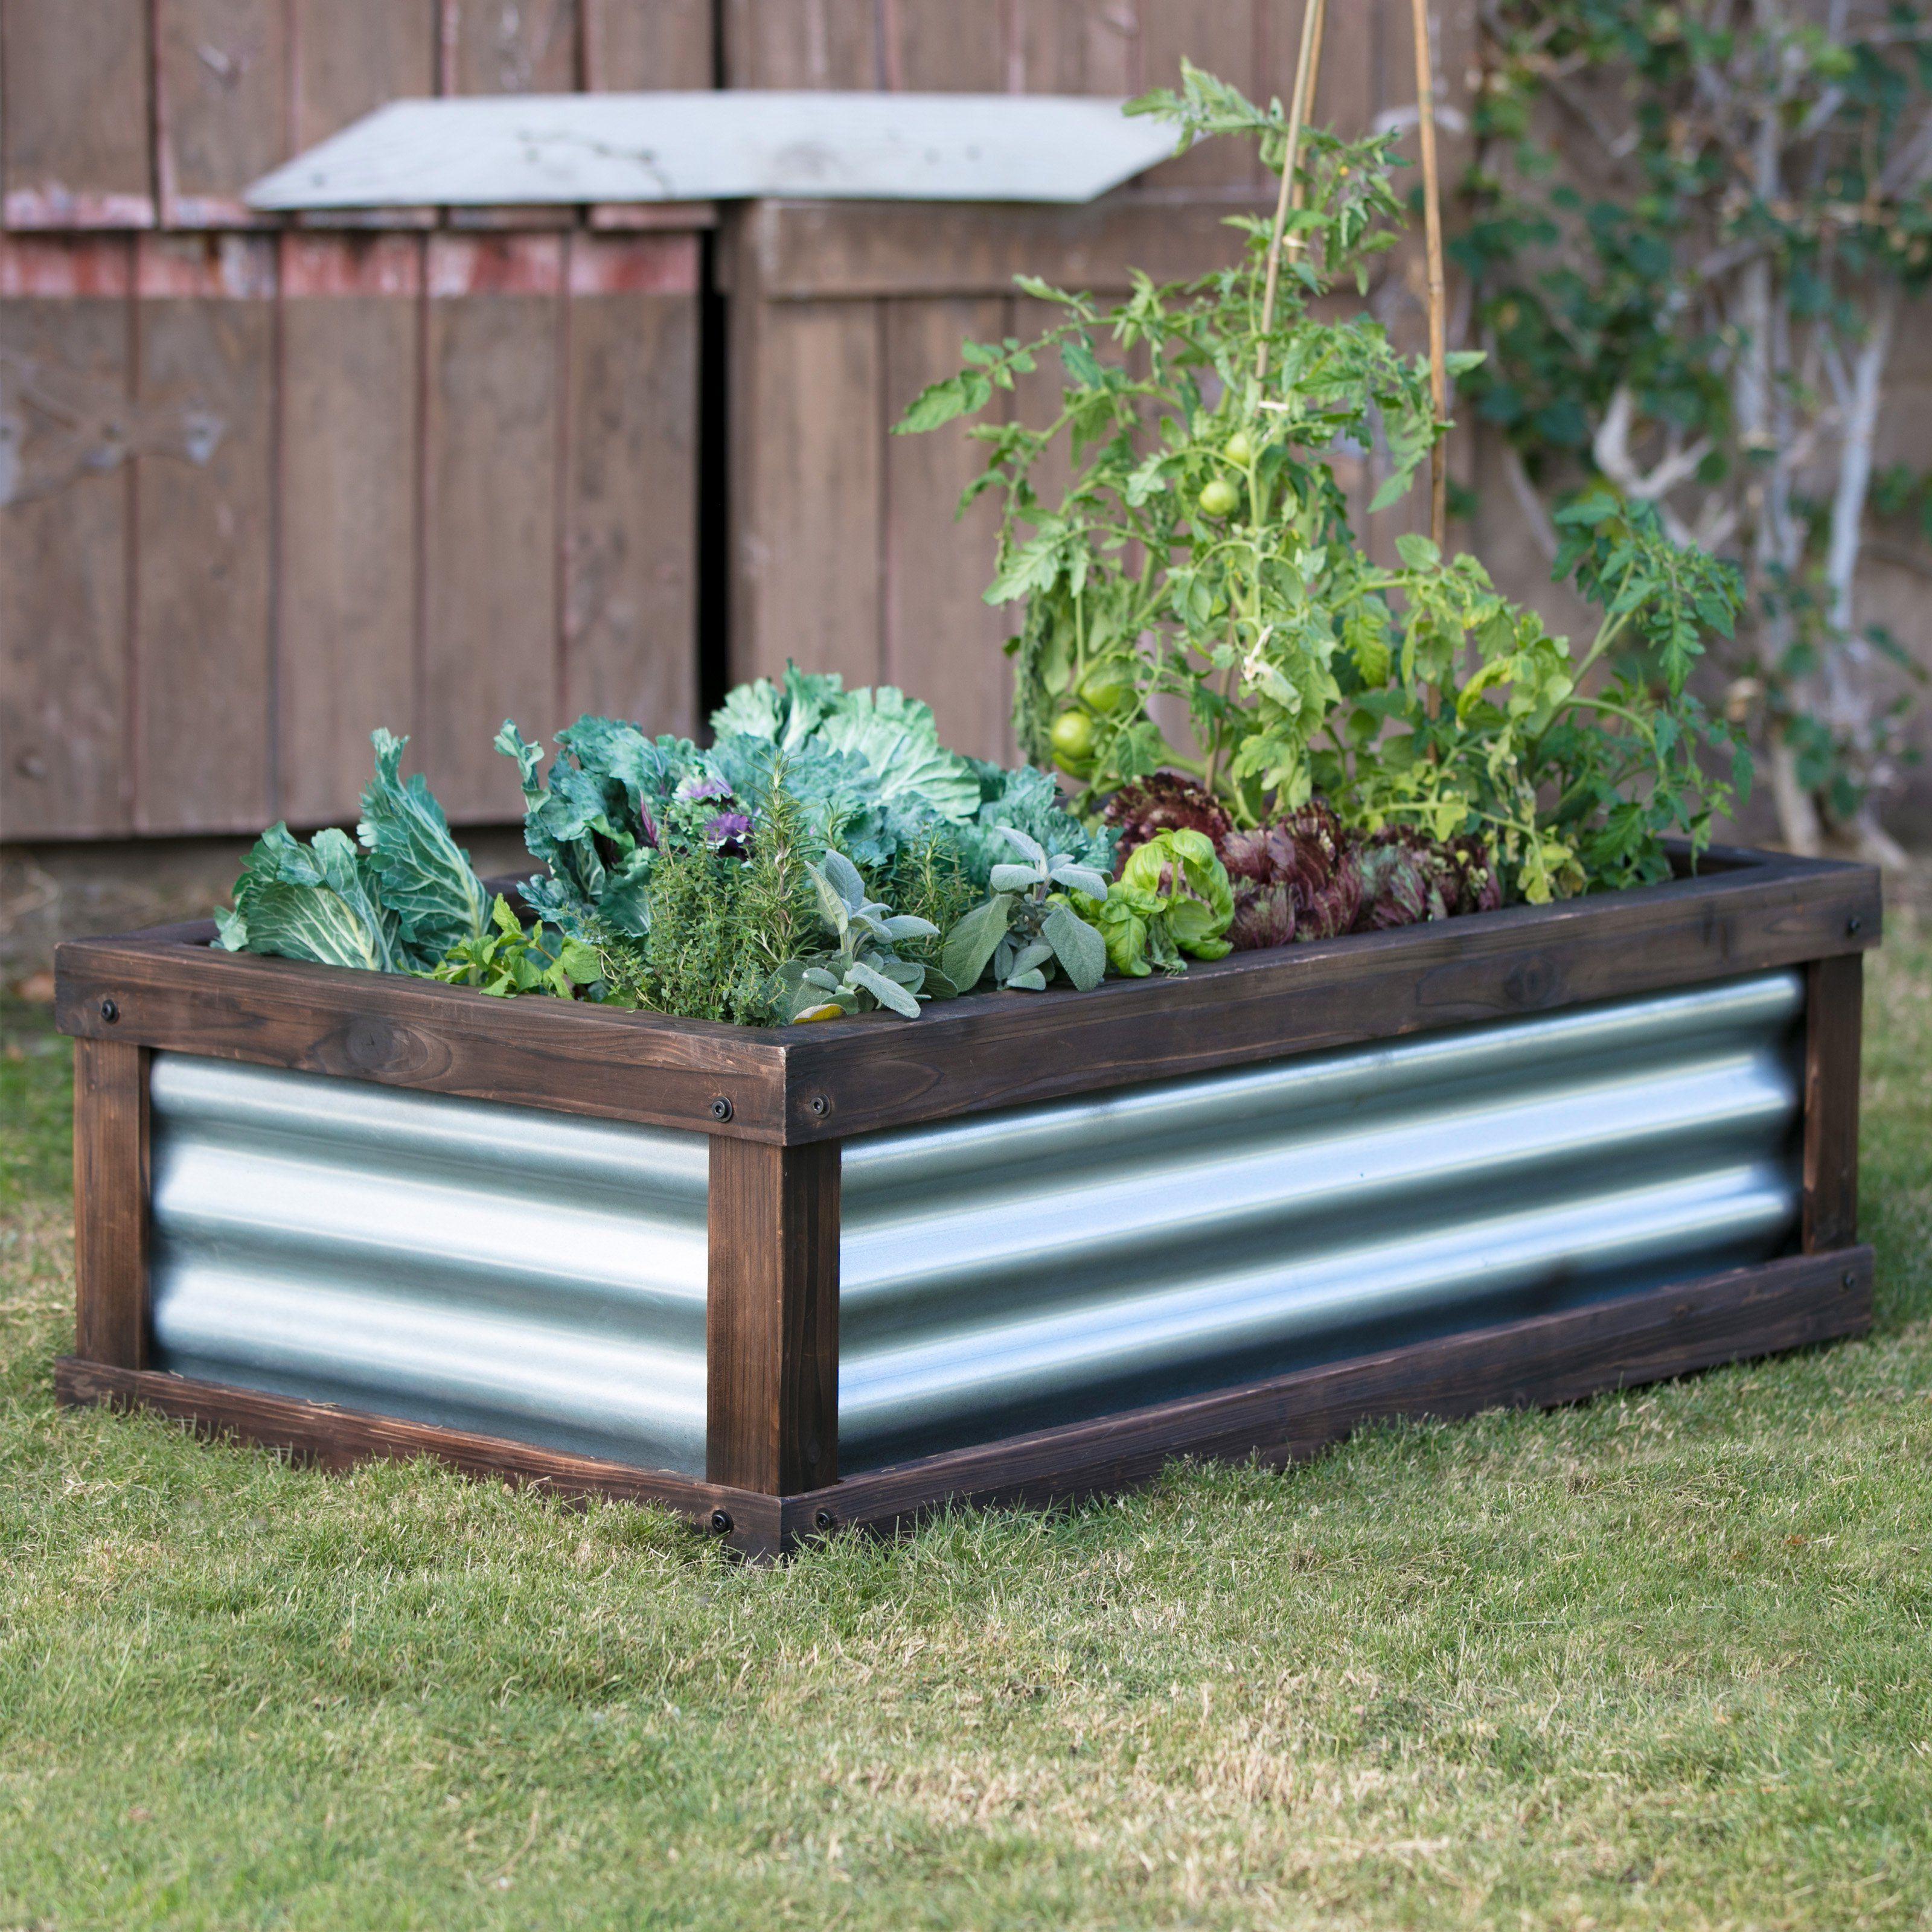 Coral Coast Guthrie Corrugated Metal & Wood Raised Garden